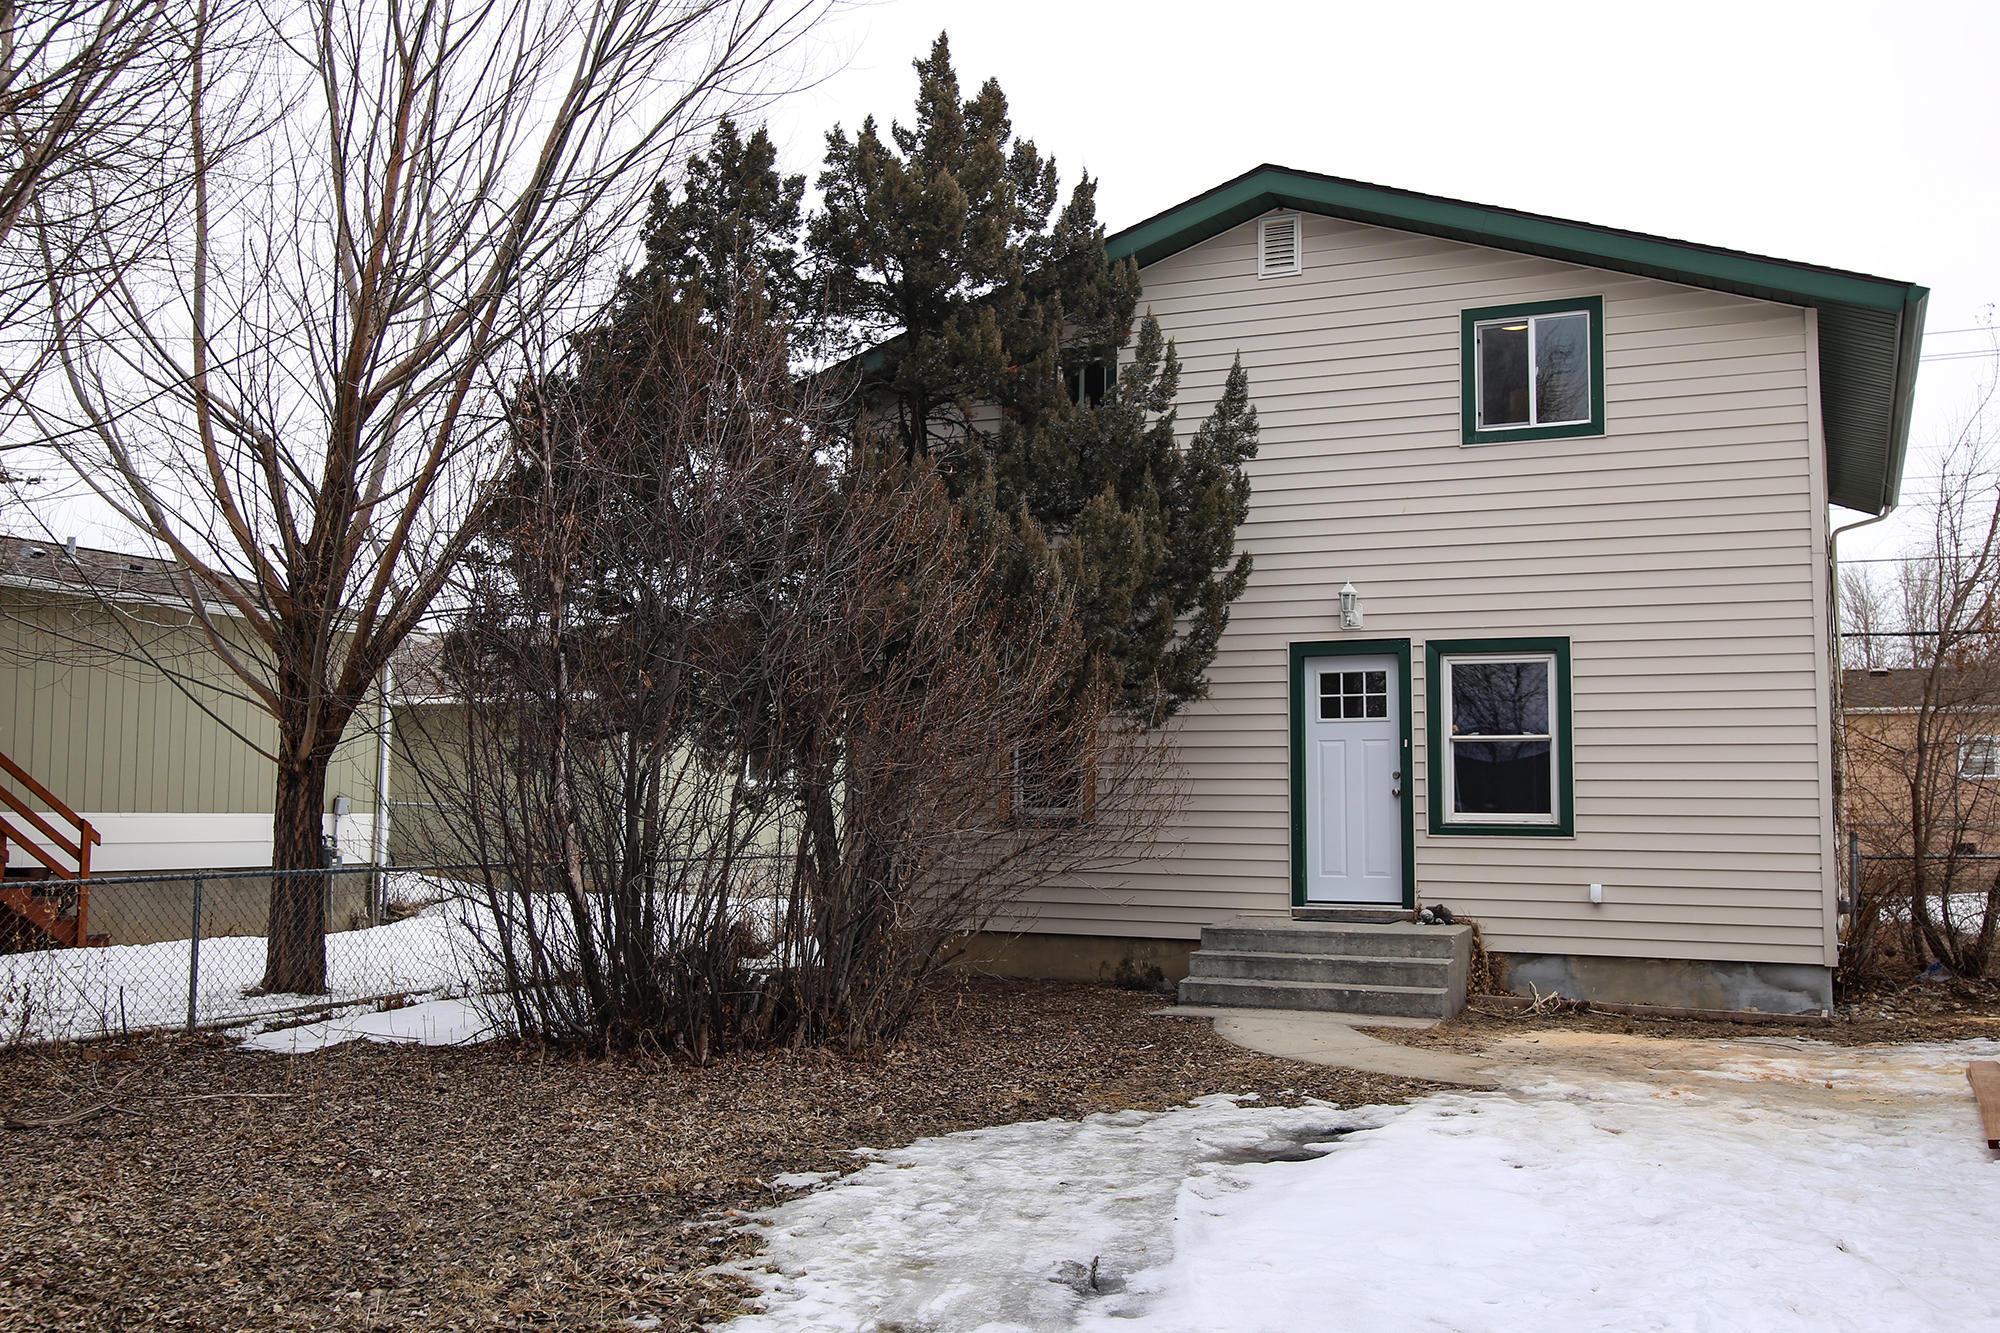 1745 Val Vista Street, Sheridan, Wyoming 82801, 4 Bedrooms Bedrooms, ,2 BathroomsBathrooms,Residential,For Sale,Val Vista,19-217